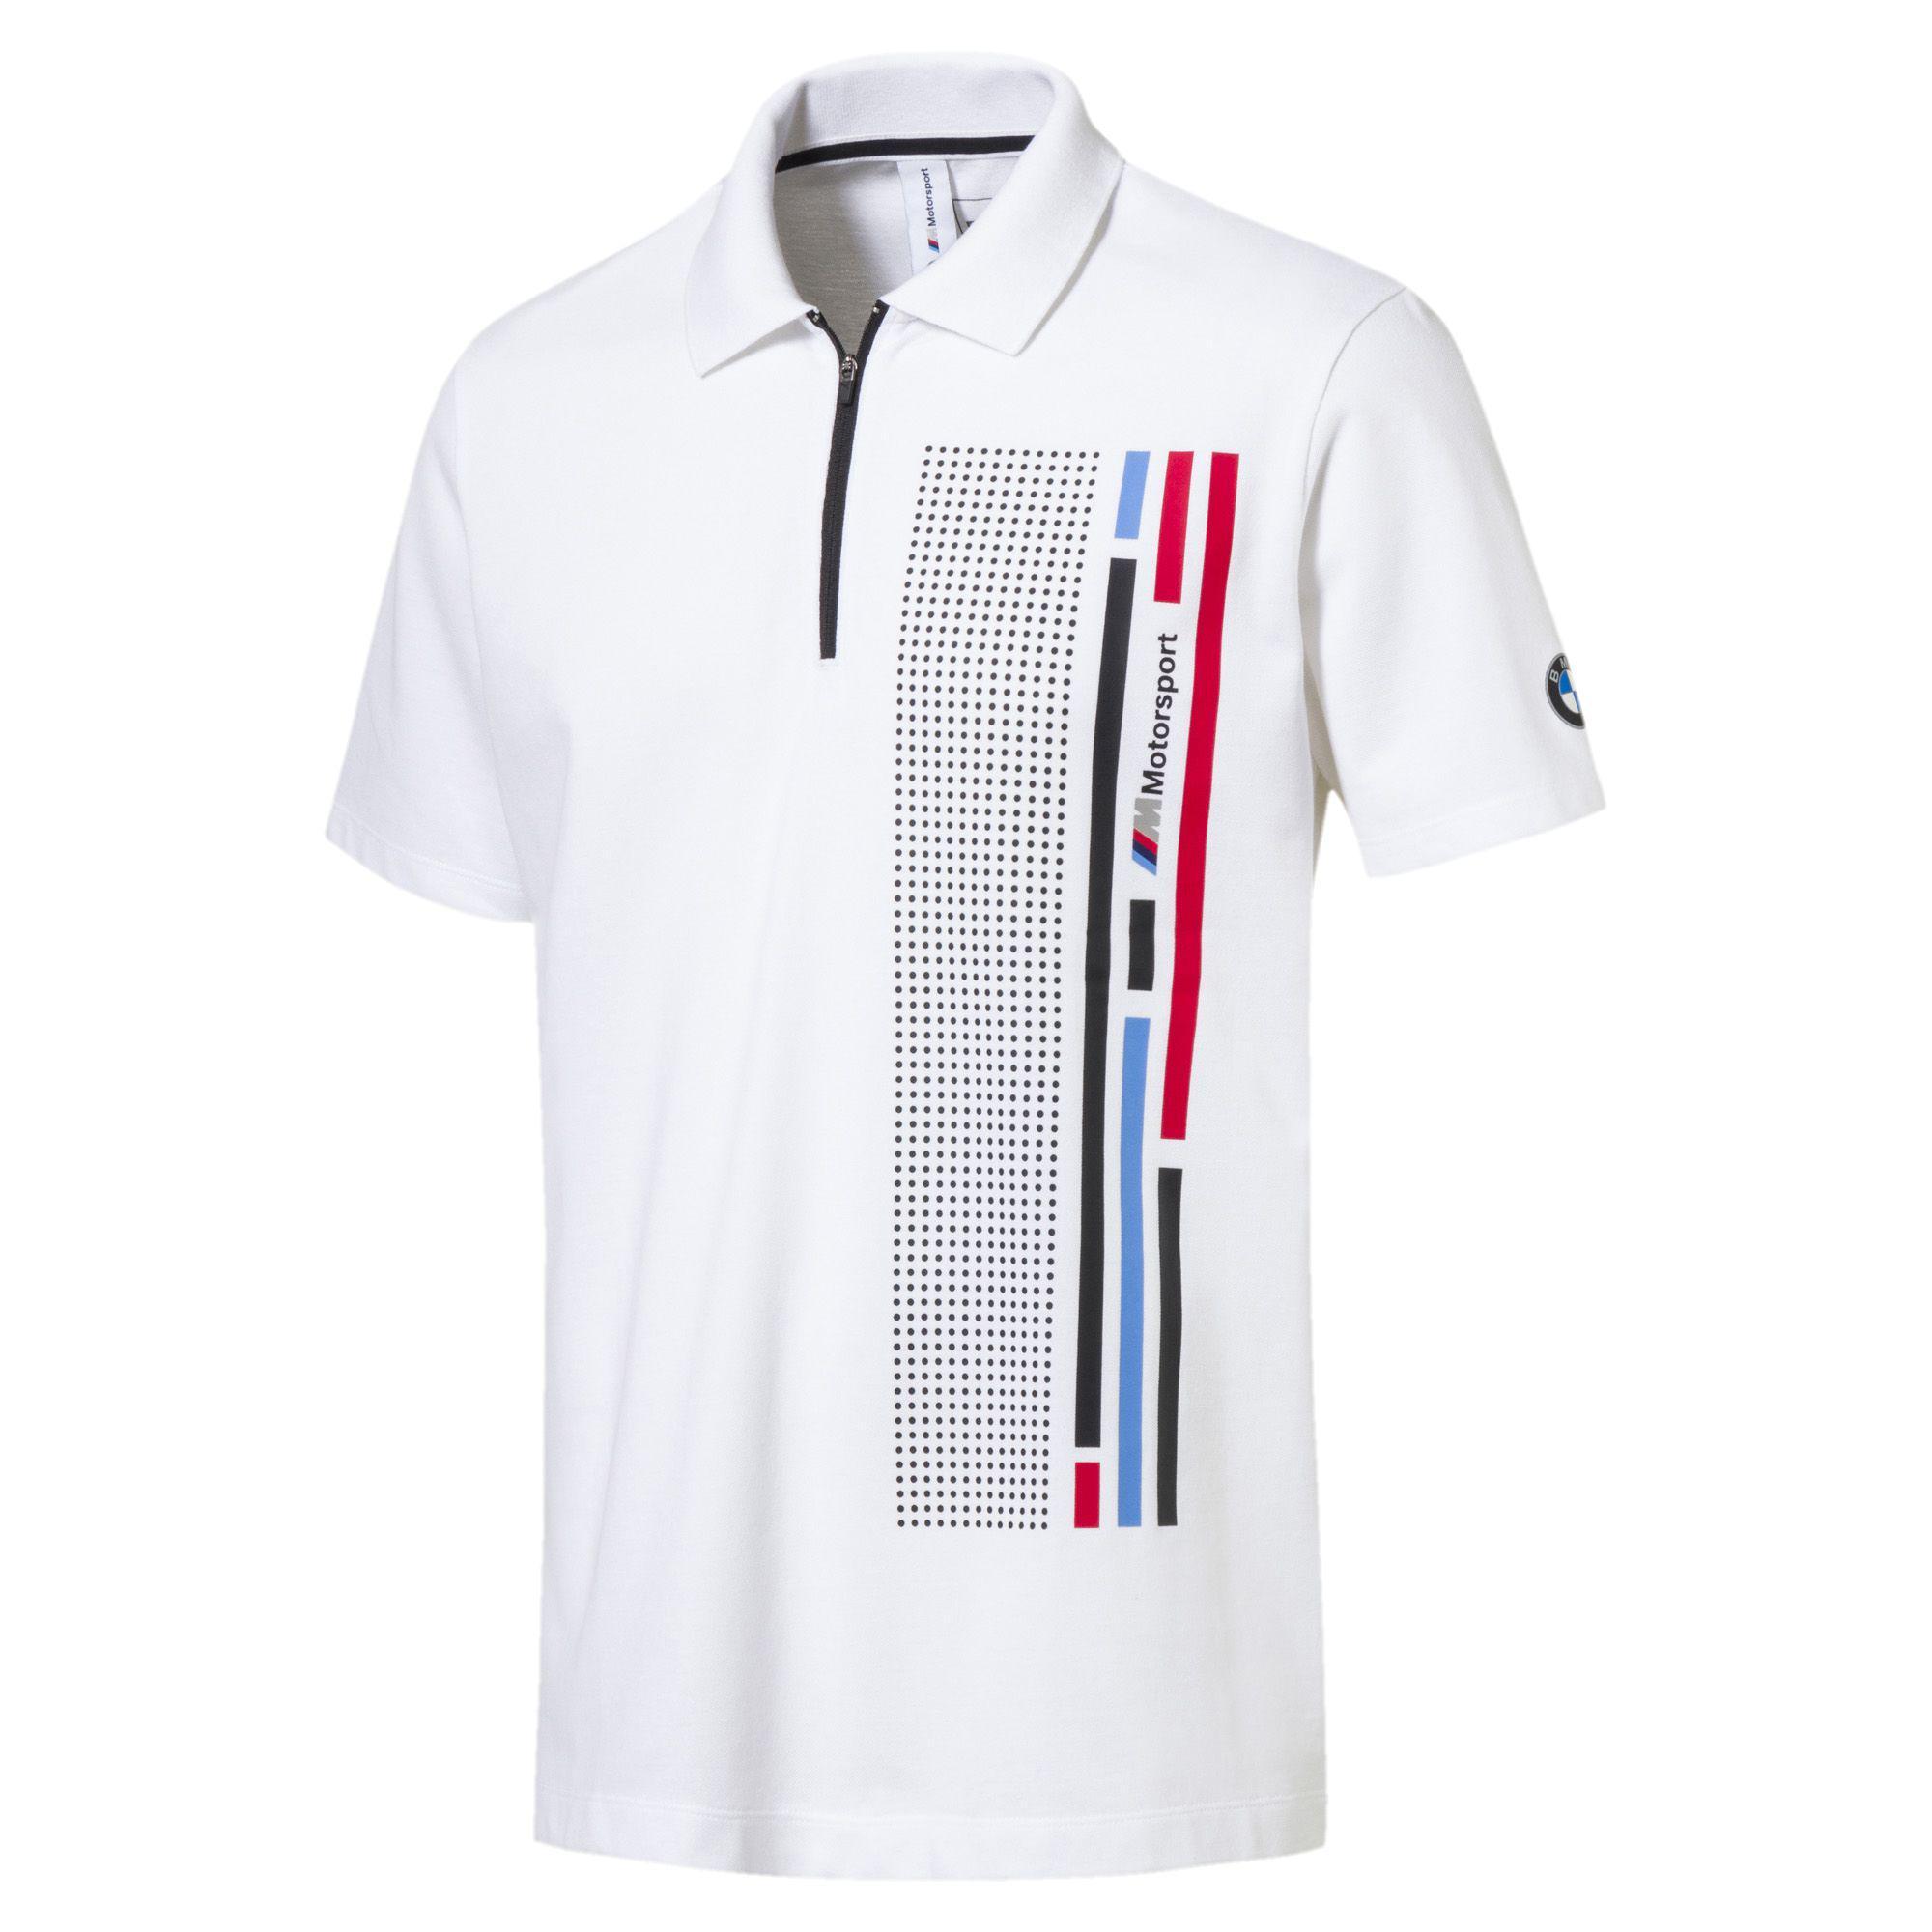 56bde902948 Lyst - PUMA Bmw Mms Quarter Zip Men s Graphic Polo in White for Men